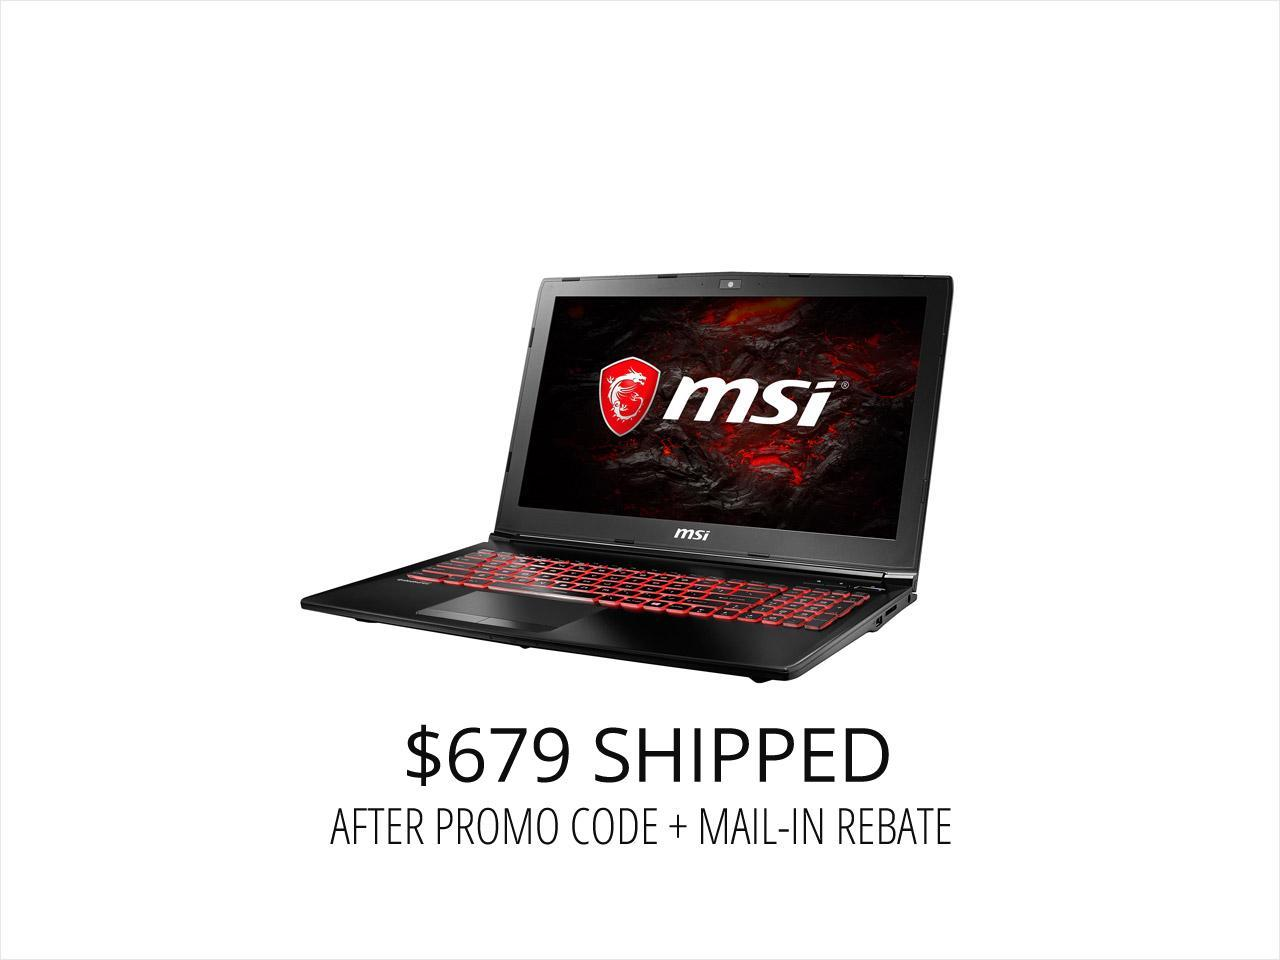 "MSI GL62M 7RDX-NE1050i7 15.6"" Intel Core i7 7th Gen 7700HQ (2.80 GHz) NVIDIA GeForce GTX 1050 8 GB Memory 128 GB NVMe SSD 1 TB HDD Windows 10 Home 64-Bit Gaming Laptop -- ONLY @ NEWEGG"